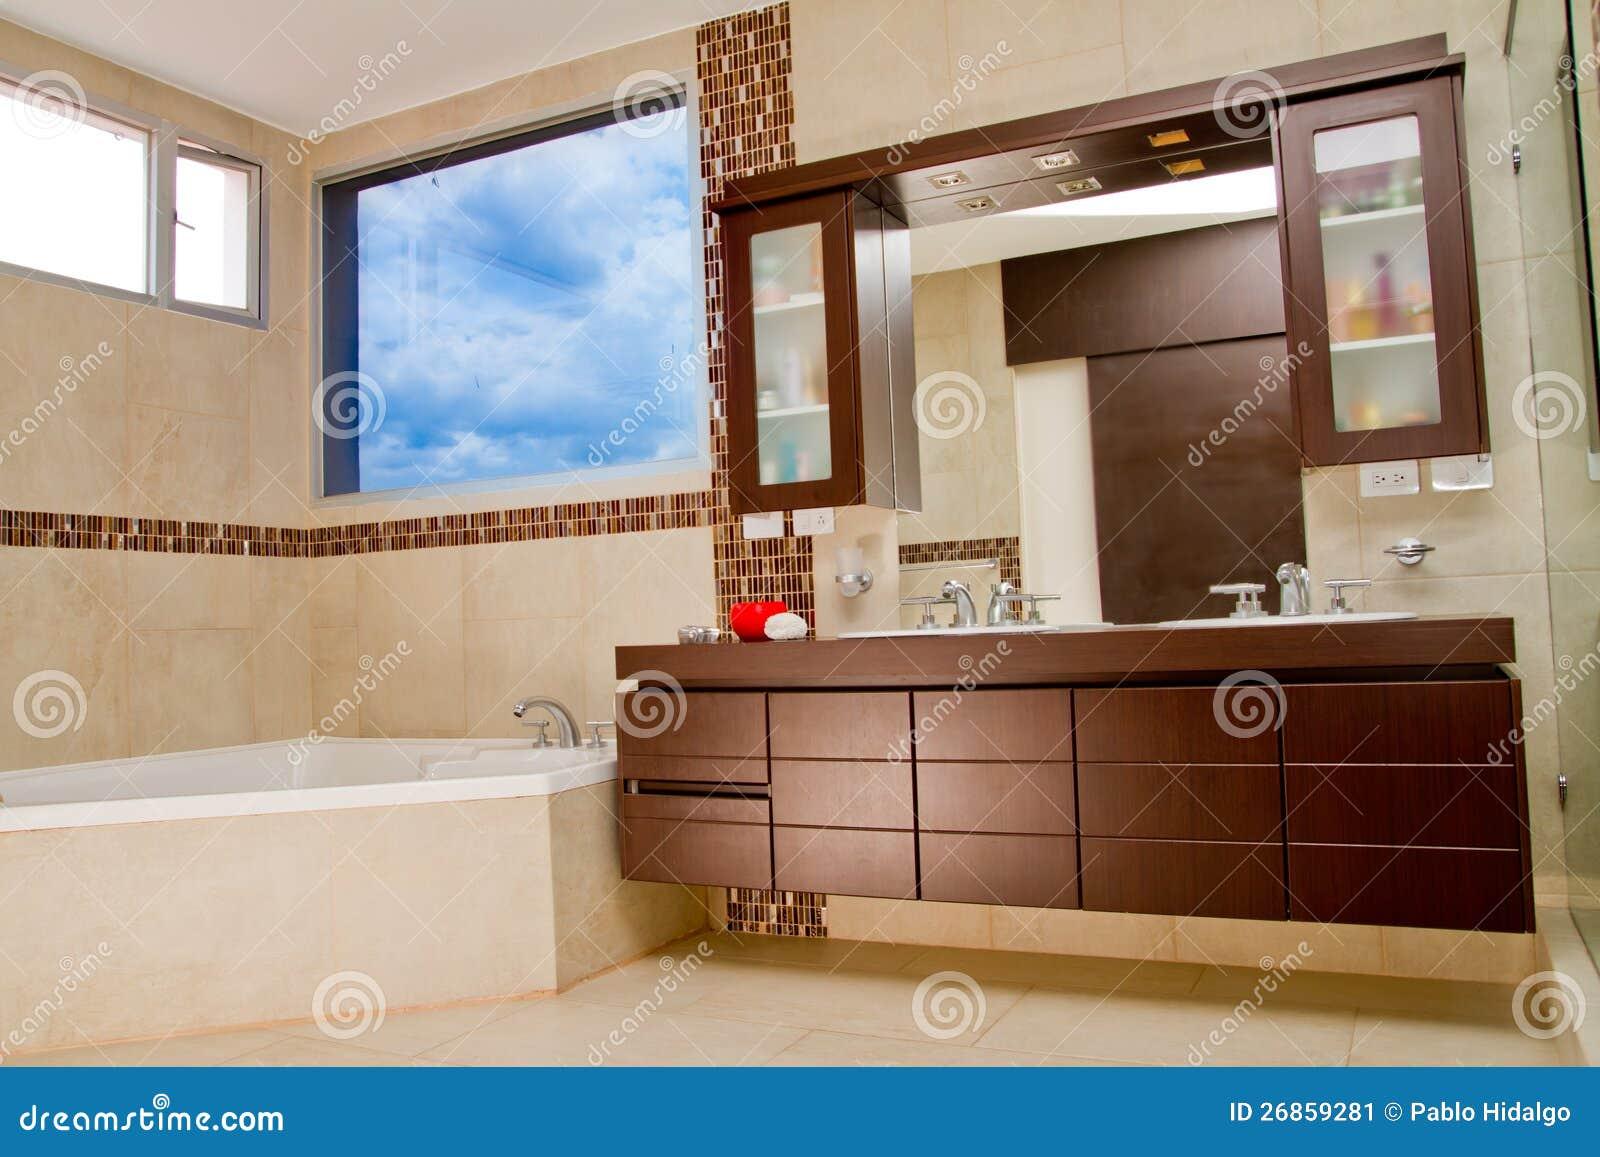 Interior of bathroom in modern house hot tub stock image for Modern house interior bathroom